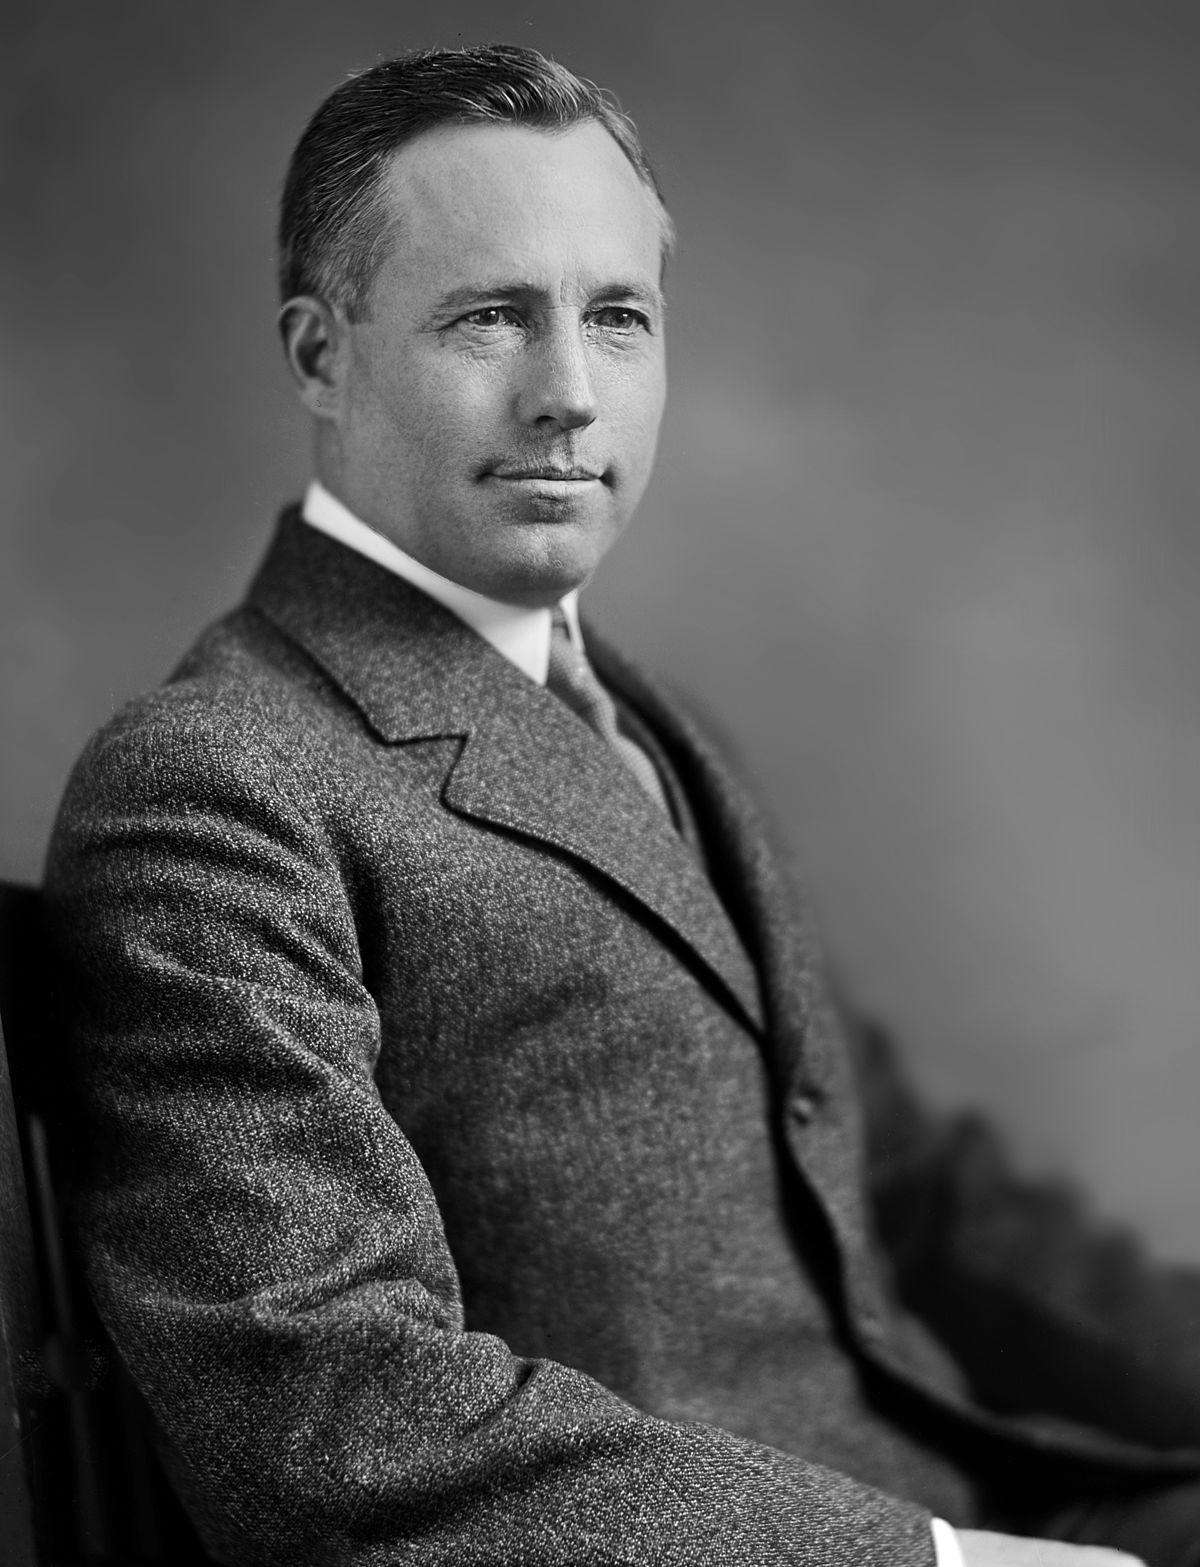 Jesse B. Jackson - Wikipedia